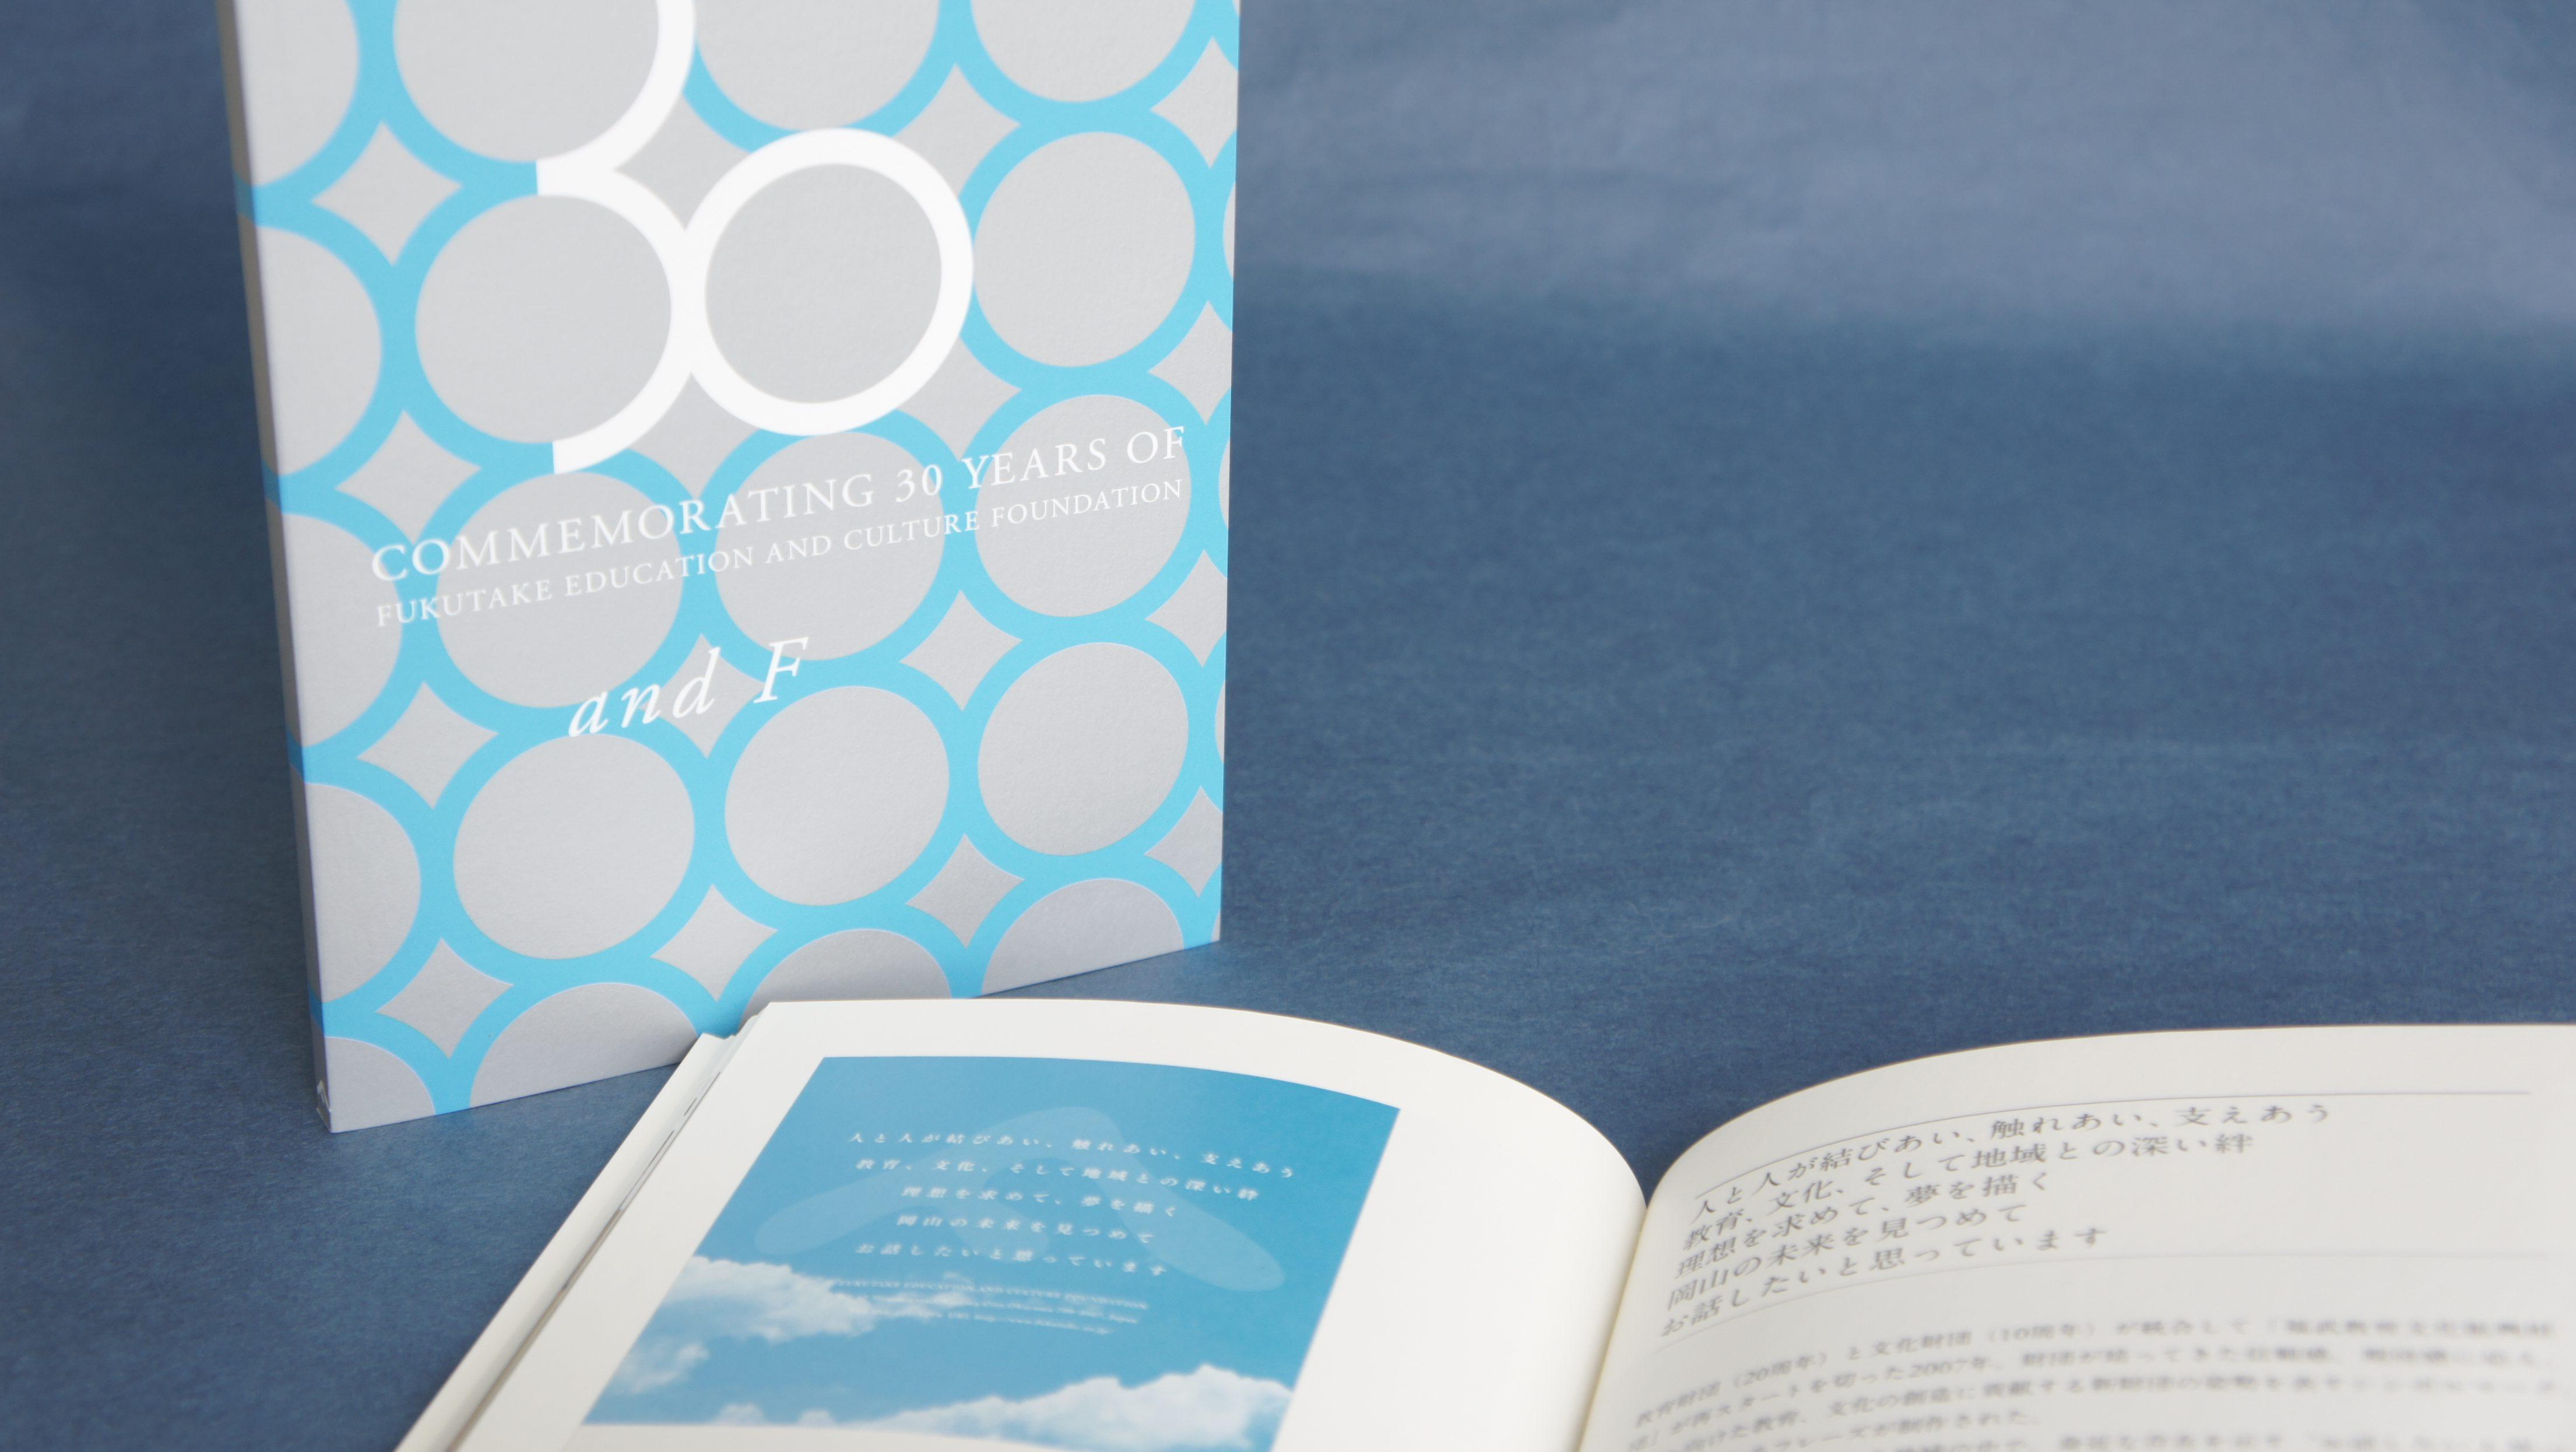 『andF――福武教育文化振興財団設立30周年記念誌』